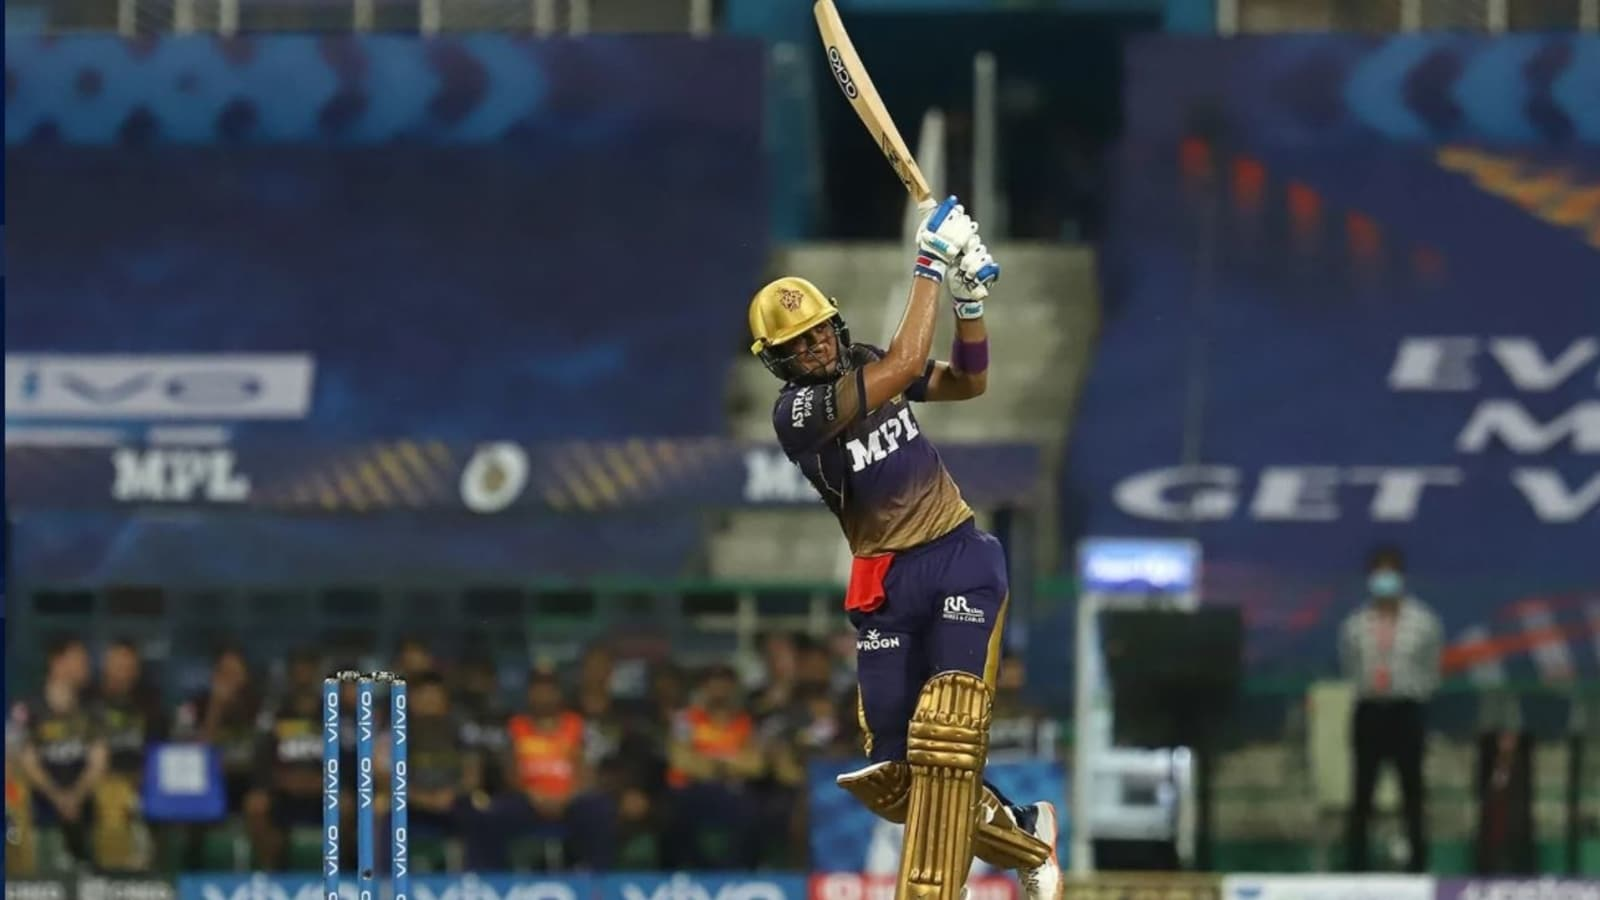 KKR vs RCB Highlights, IPL 2021: Kolkata Knight Riders beat Royal Challengers Bangalore by 9 wickets | Hindustan Times